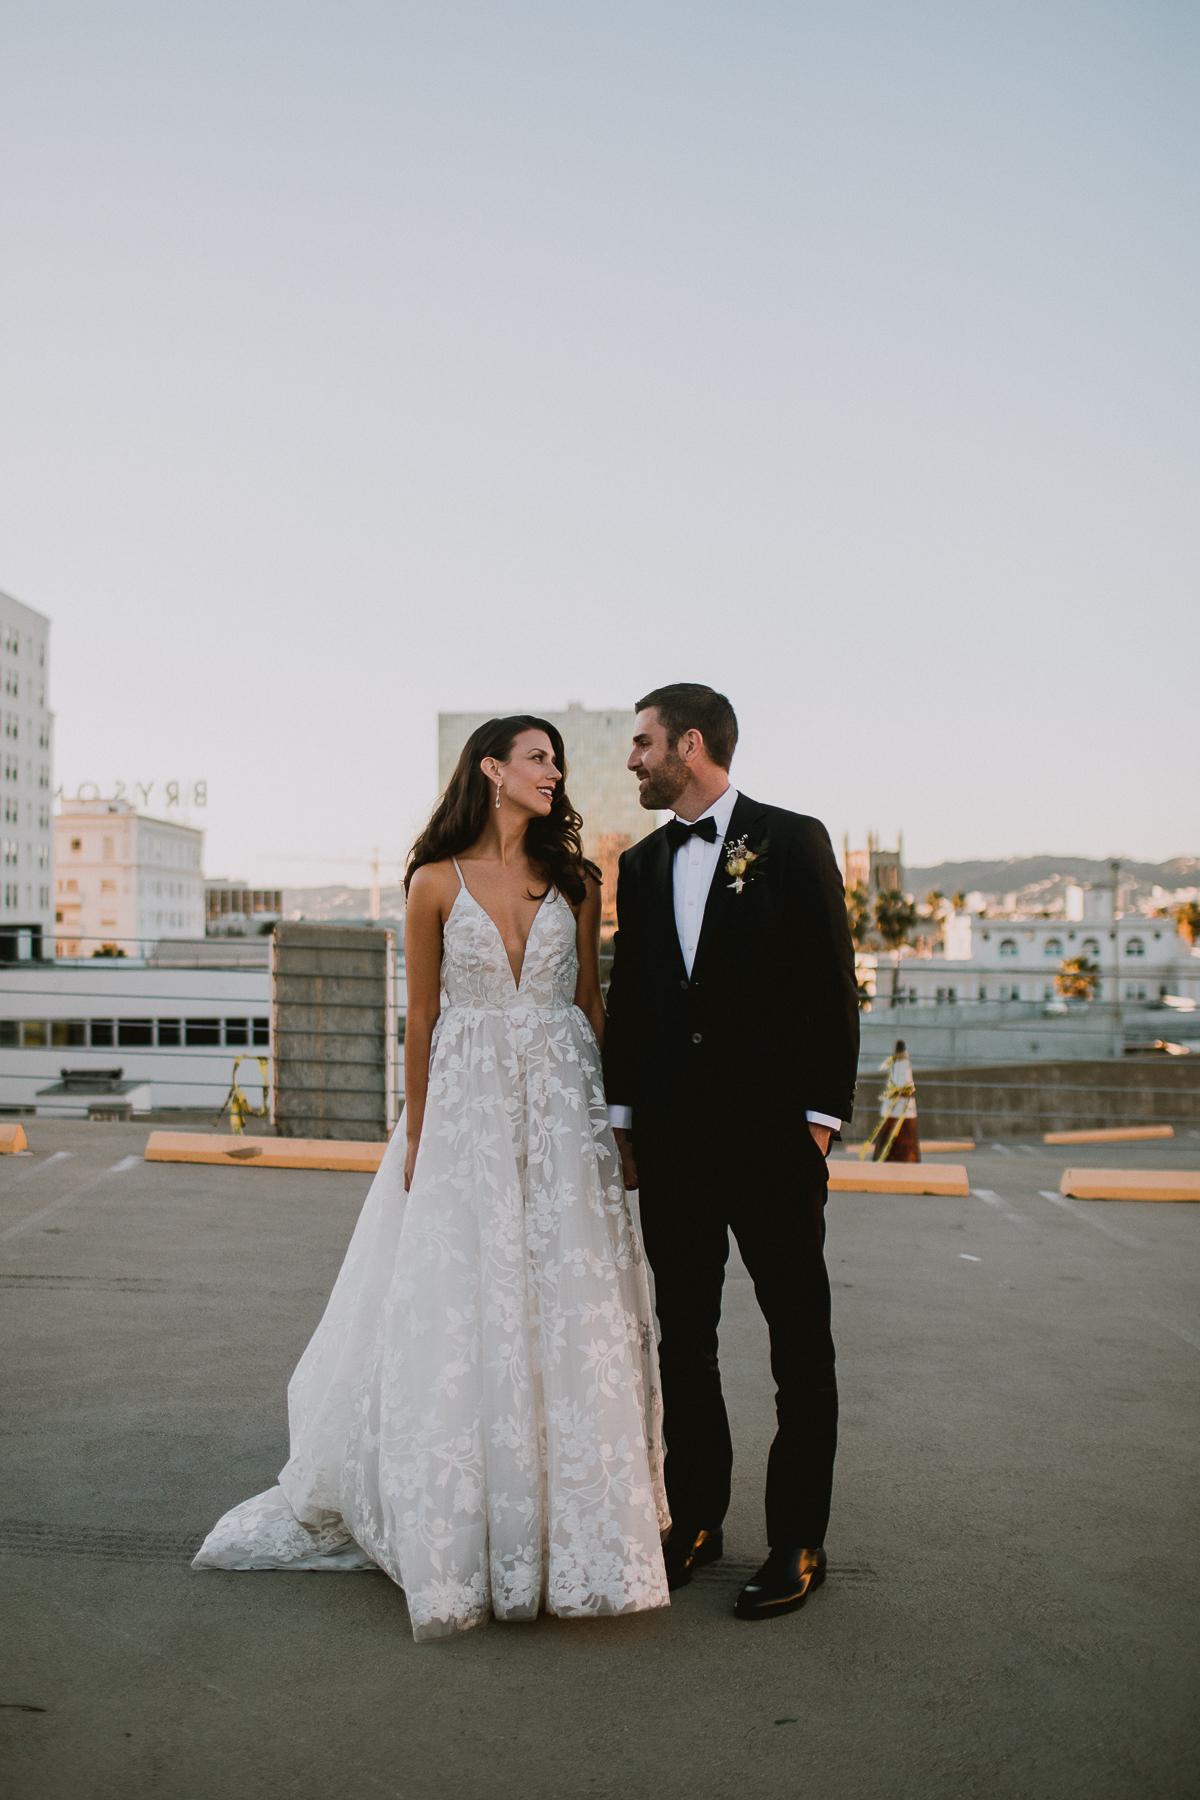 carondelet-house-kelley-raye-los-angeles-wedding-photographer-76.jpg